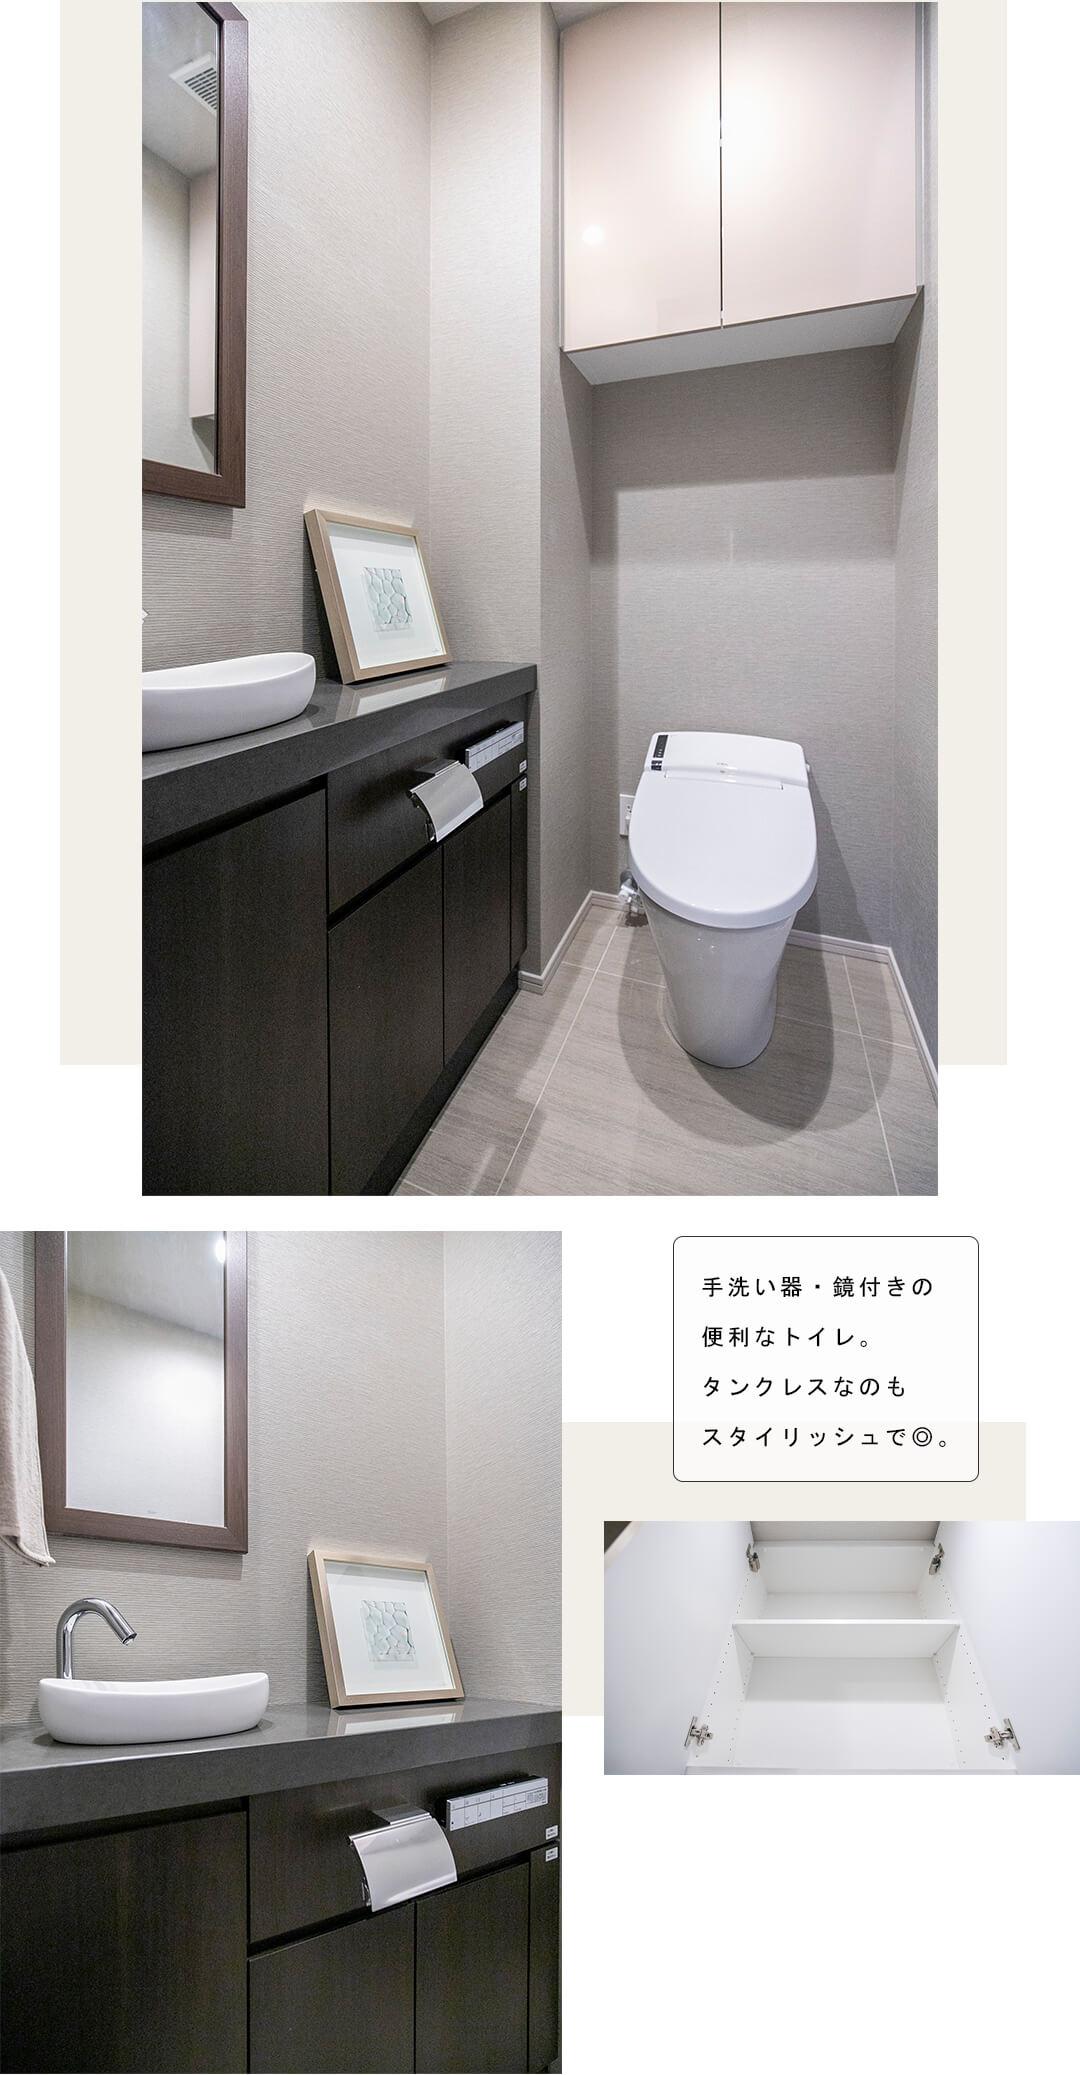 THE 千代田麹町 TOWERのトイレ